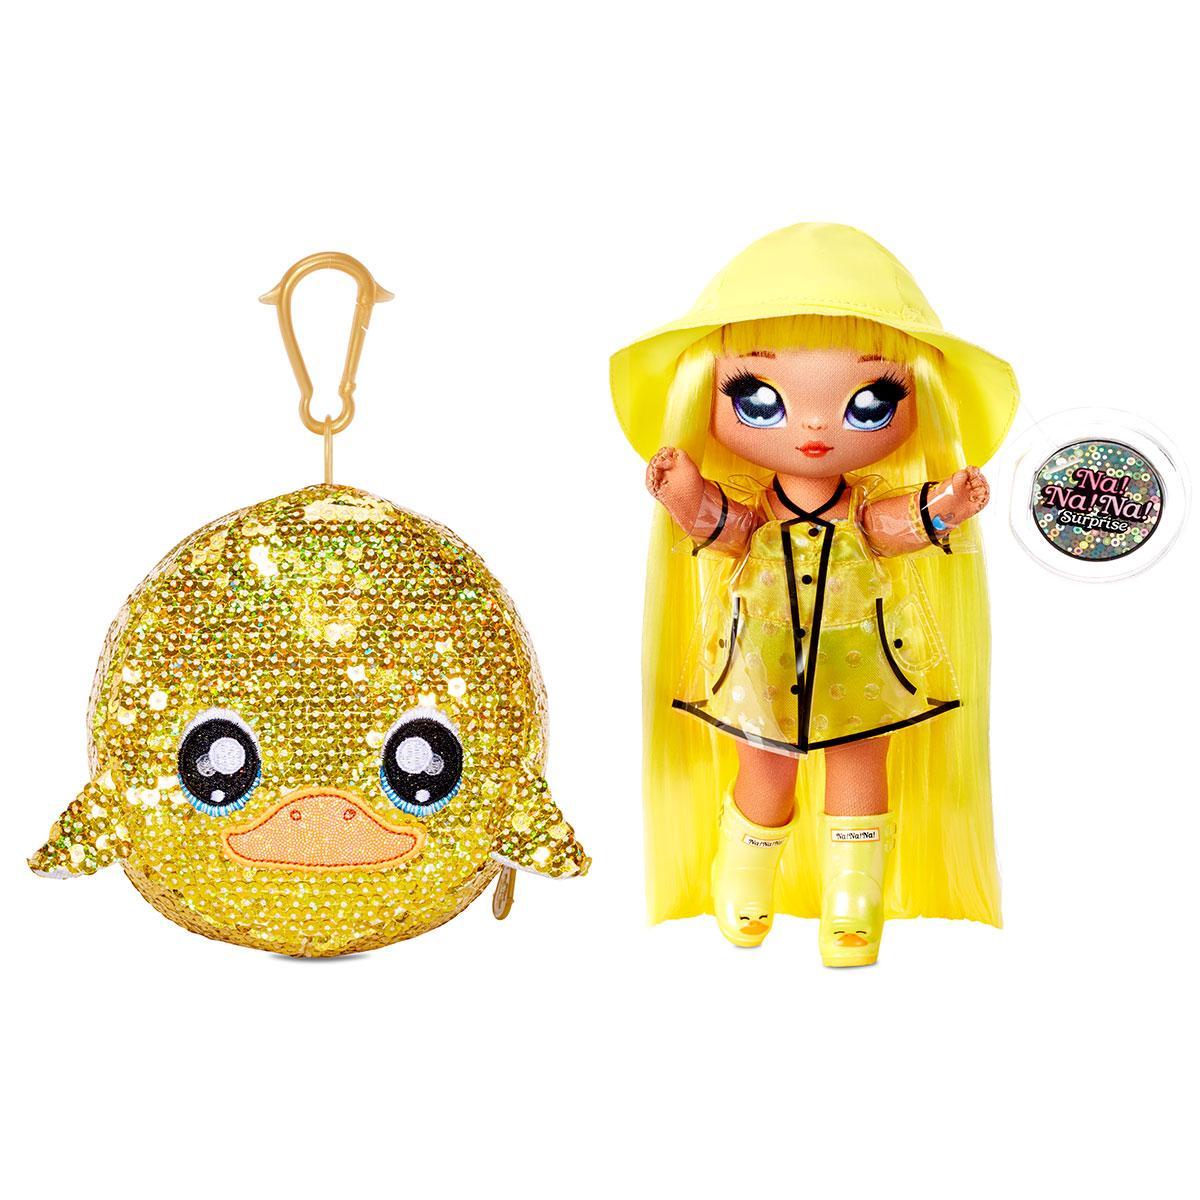 Кукла Na Na Na Surprise S3 W1 – Дарья Дакки Na! Na! Na! Surprise Sparkle Series 1 Daria Duckie 573777